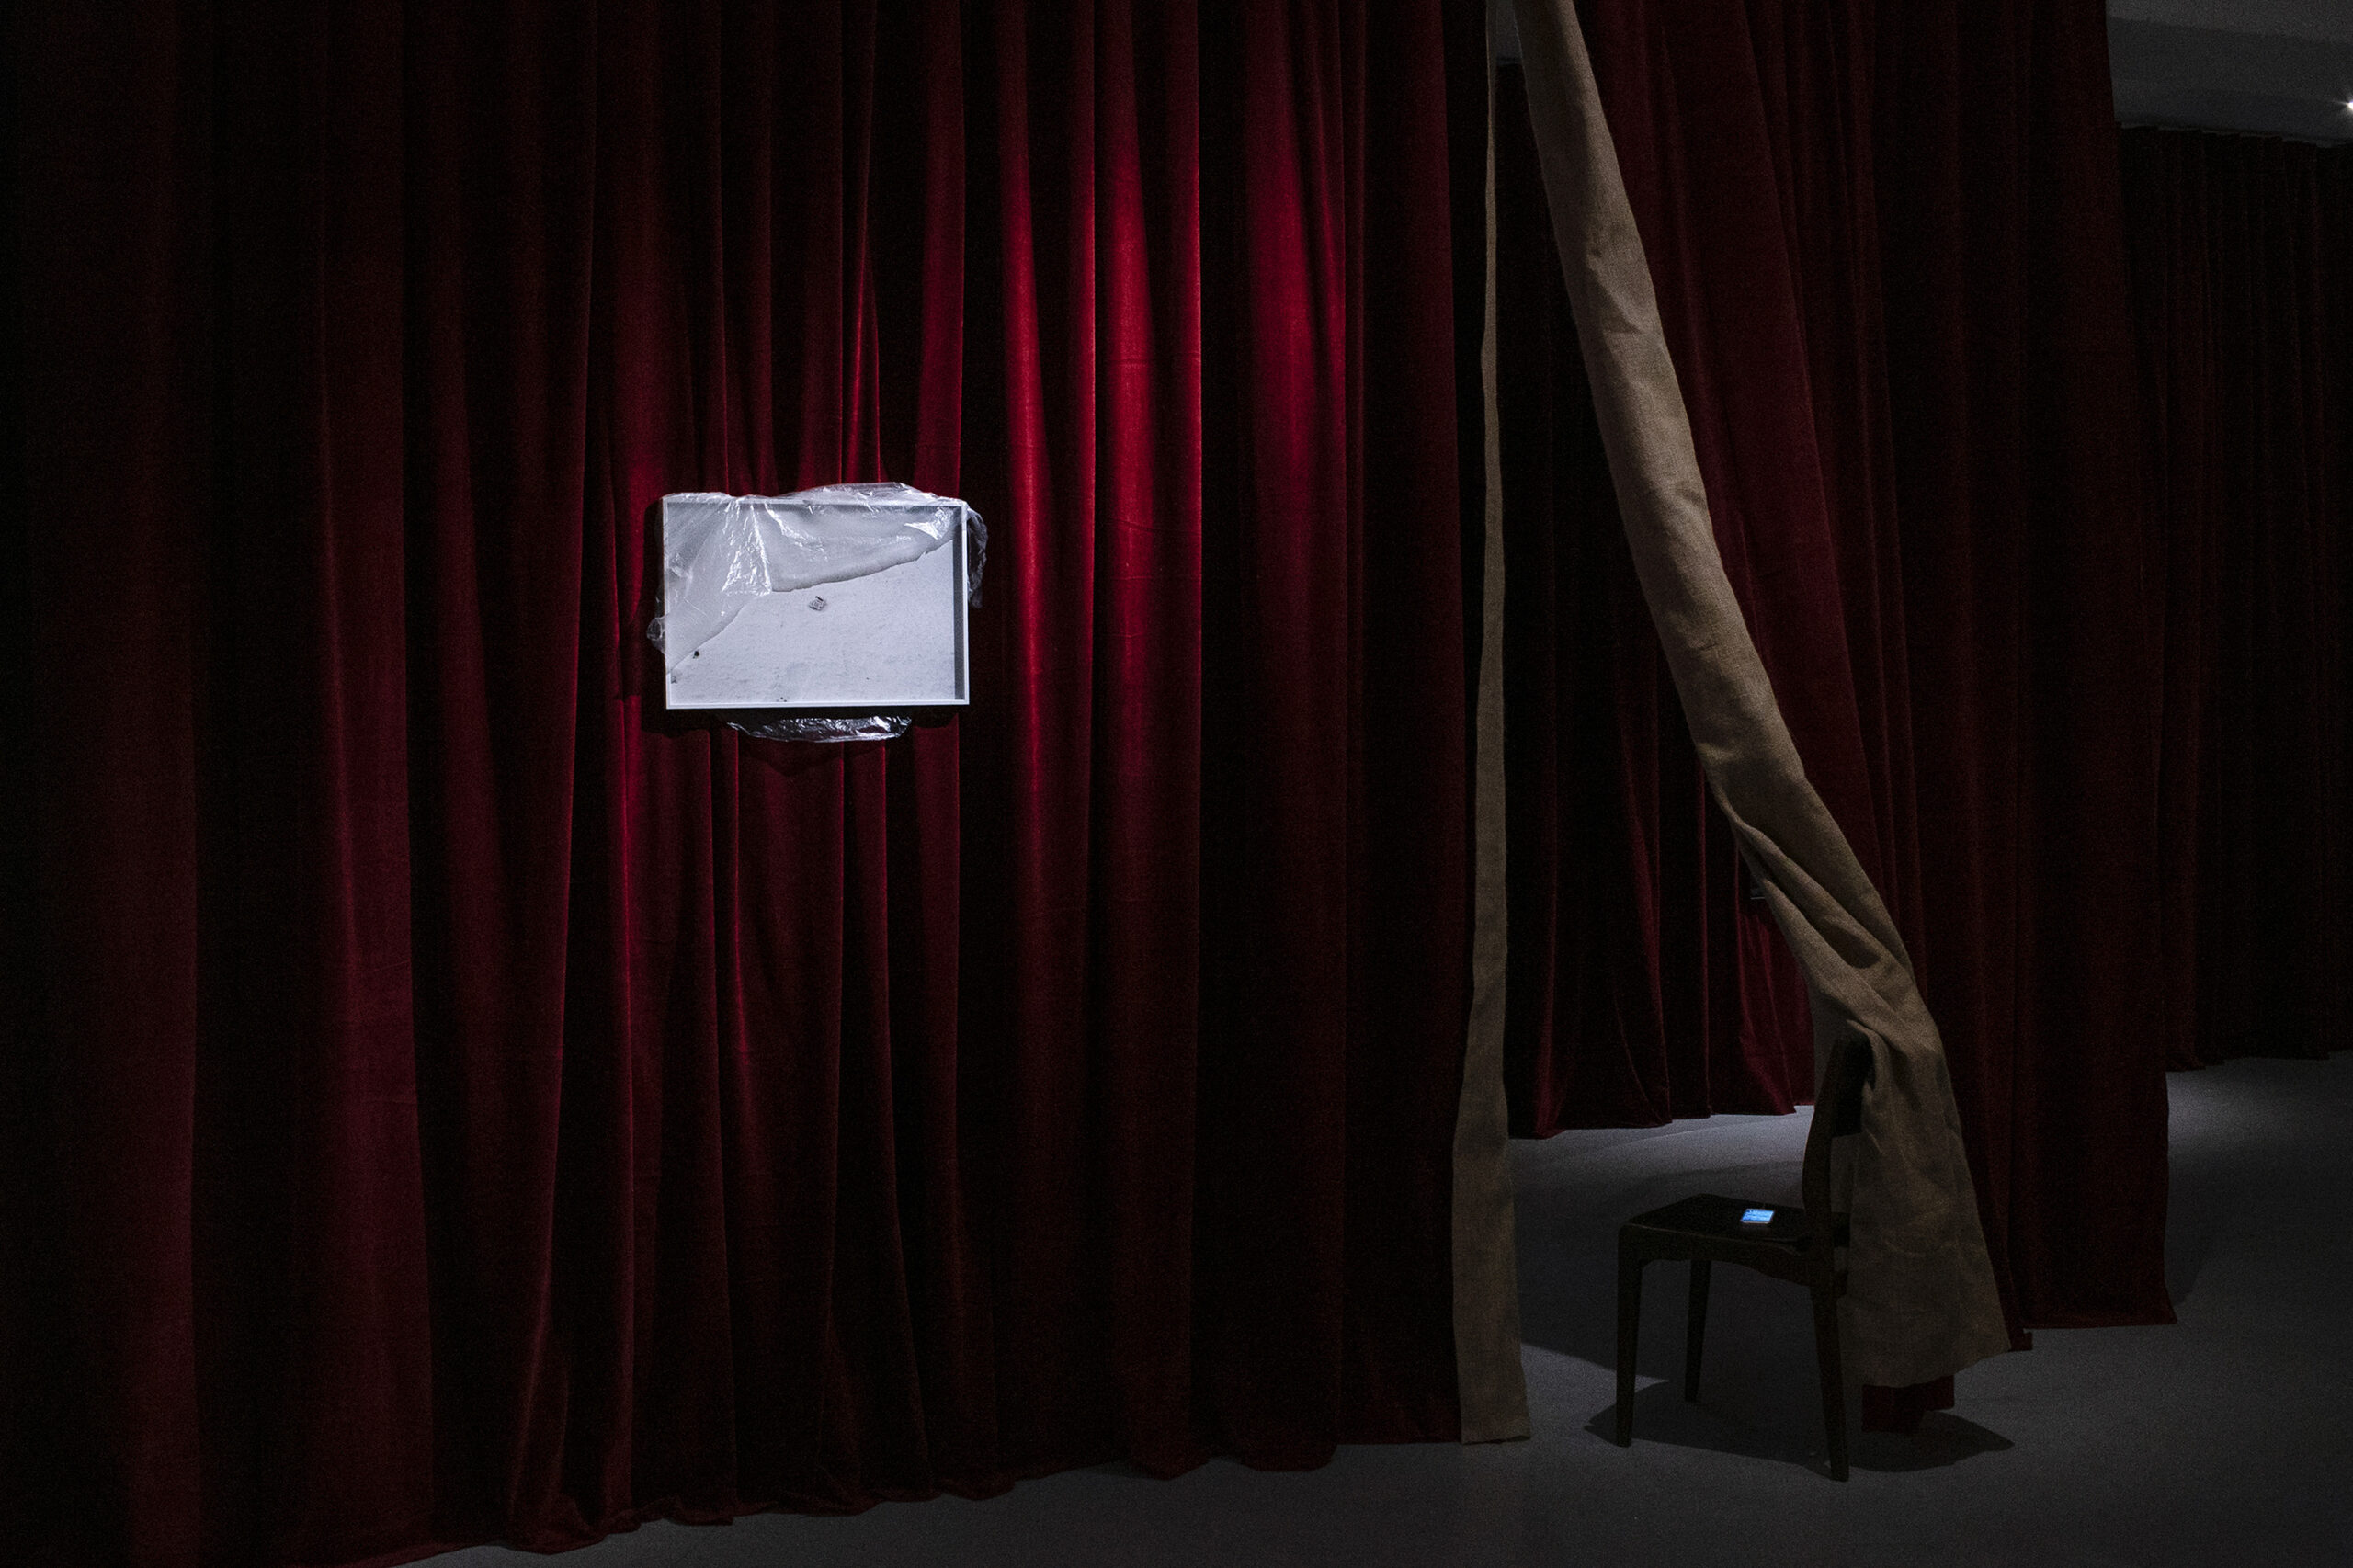 Solo Exhibition, Yiri Arts, Taipei, Taiwan, 2020